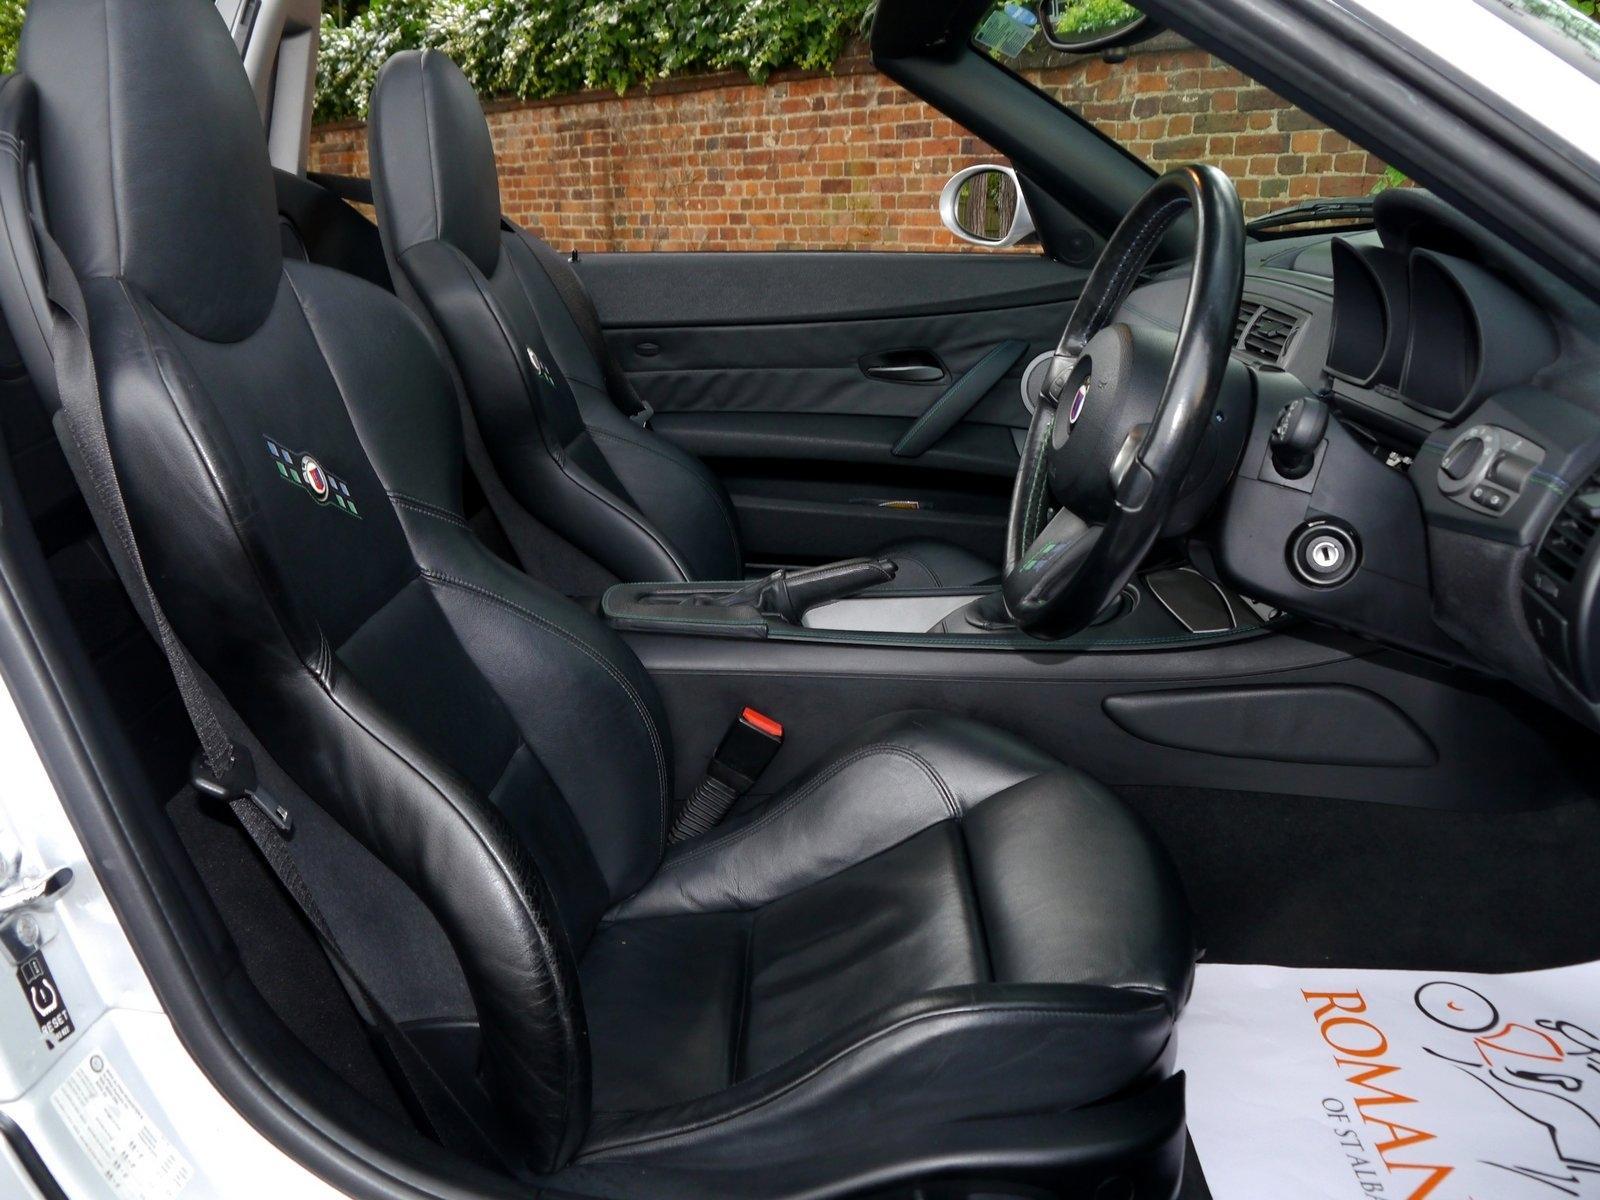 BMWALPINA ROADSTER 3.4 S LUX - RARE VEHICLE - BMW FSH #11